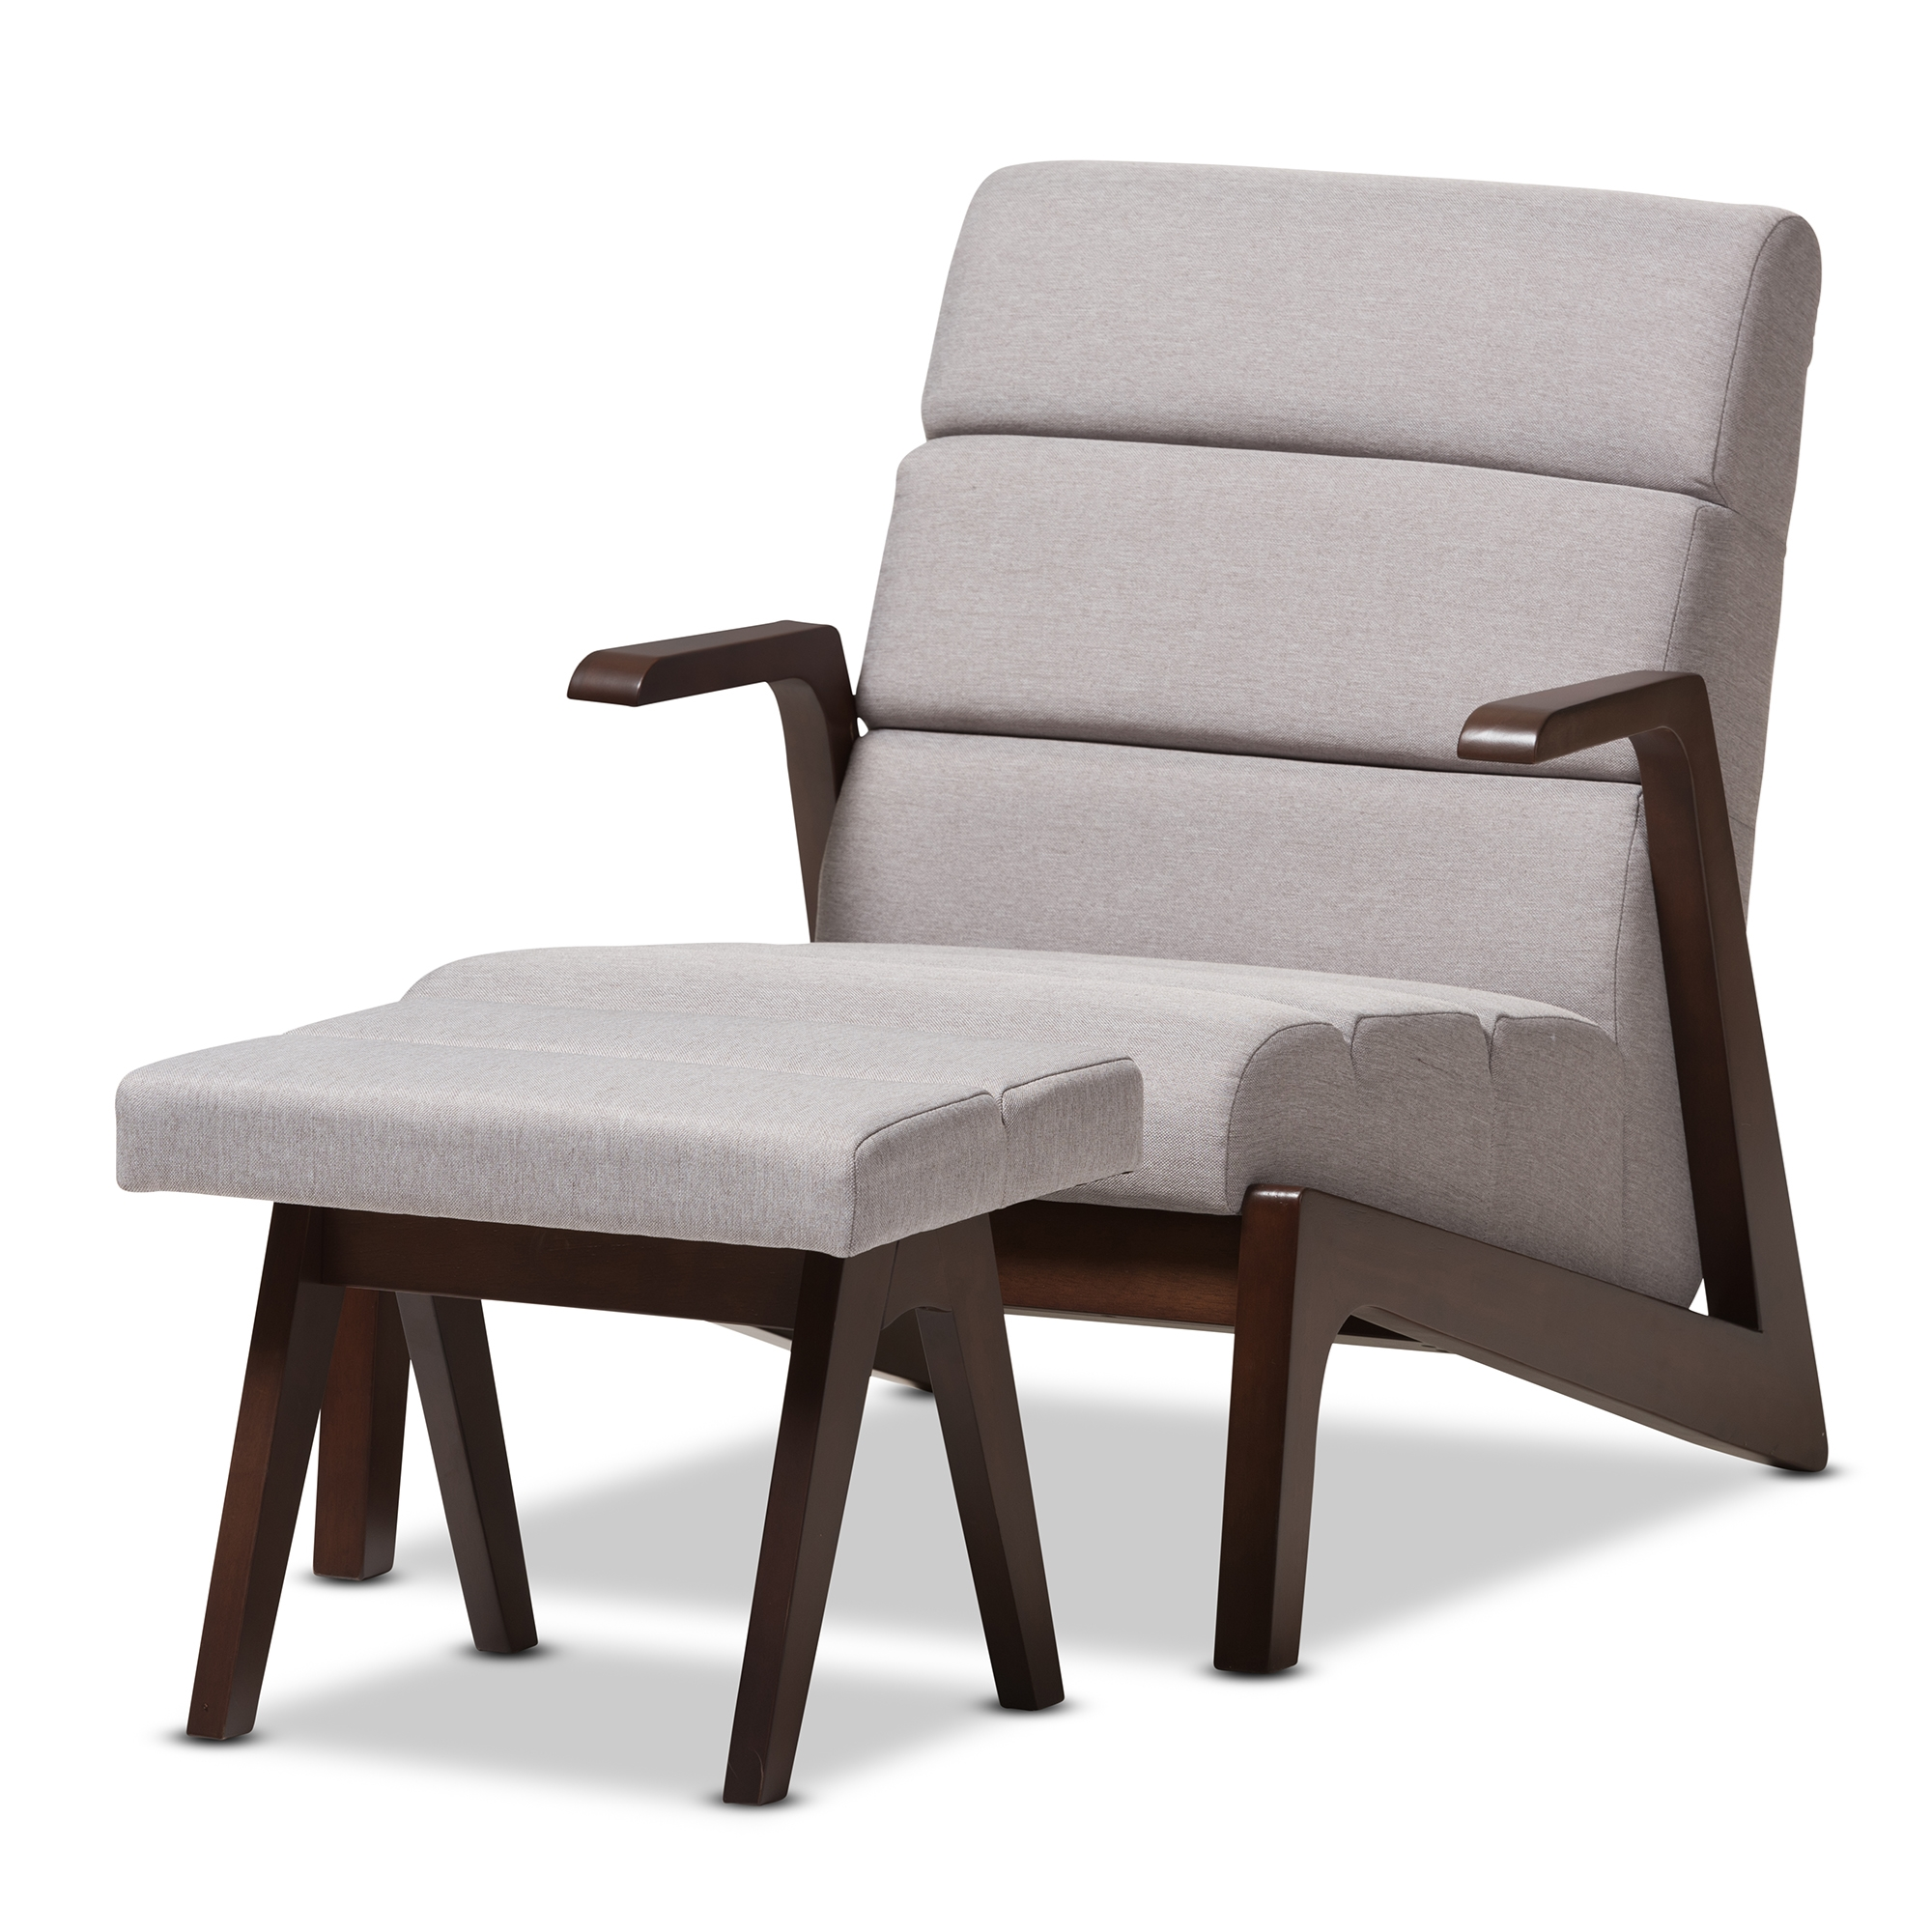 Baxton studio vino mid century modern walnut wood grey fabric lounge chair set